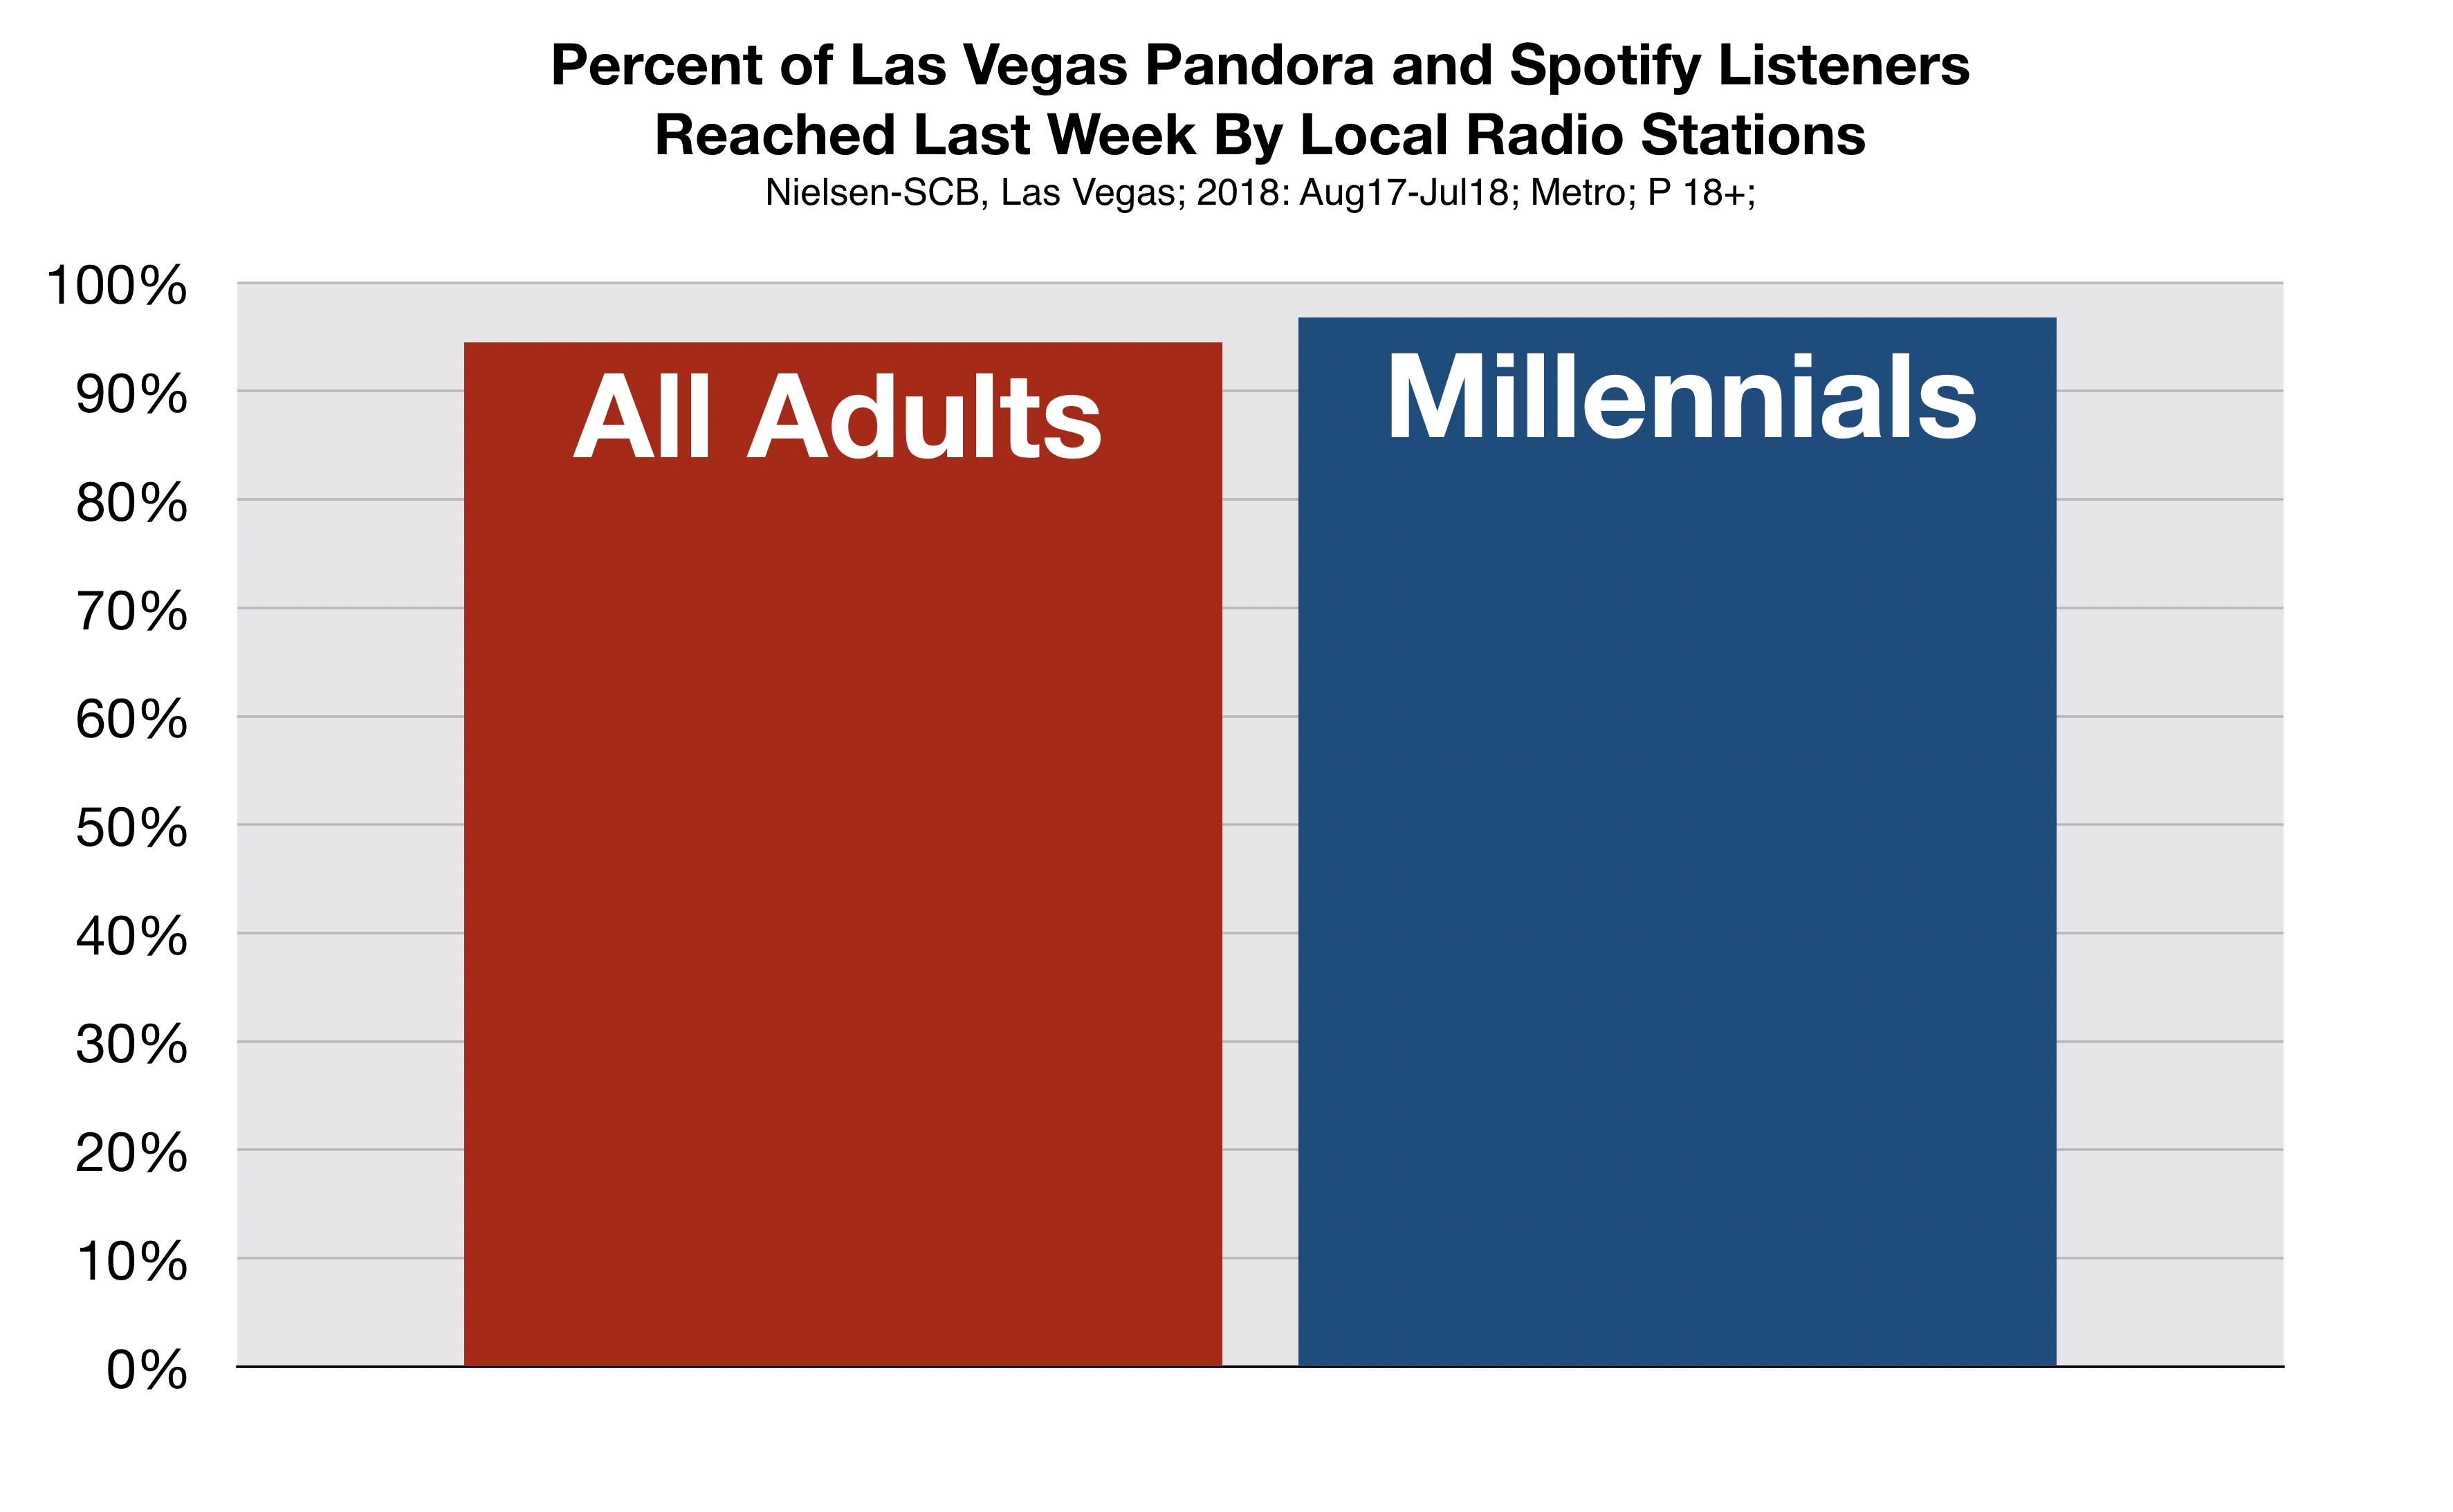 Advertising in Las Vegas Pandora and Spotify Millennials